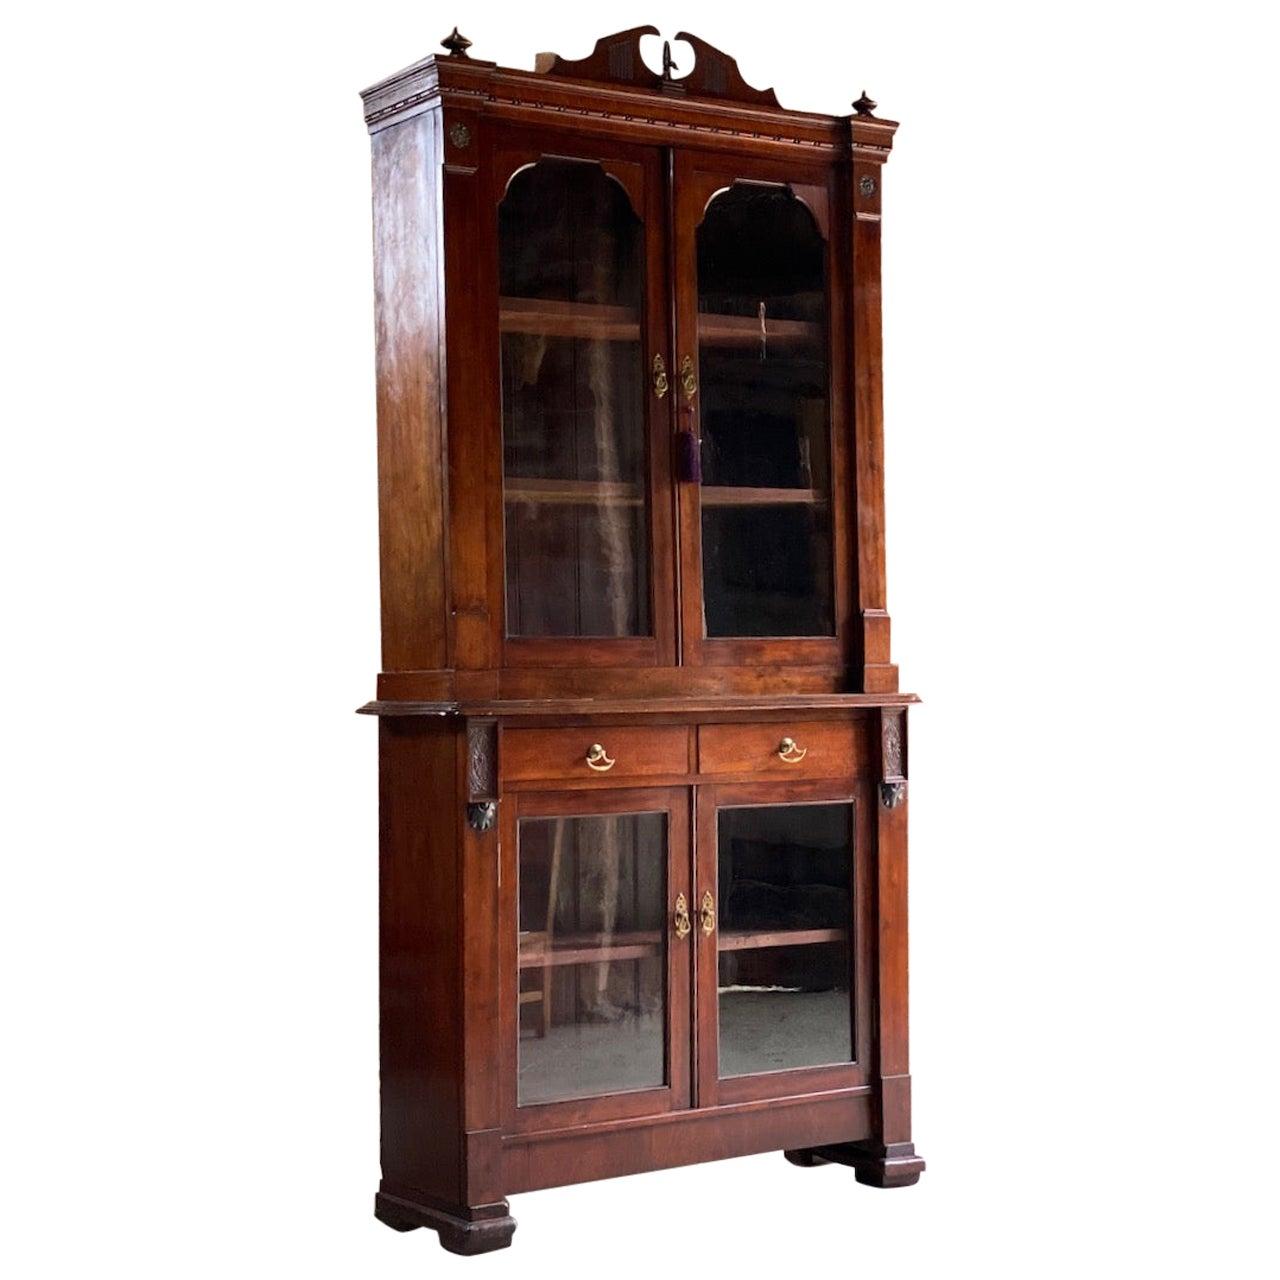 Antique Mahogany Glazed Library Bookcase Victorian 19th Century, circa 1870